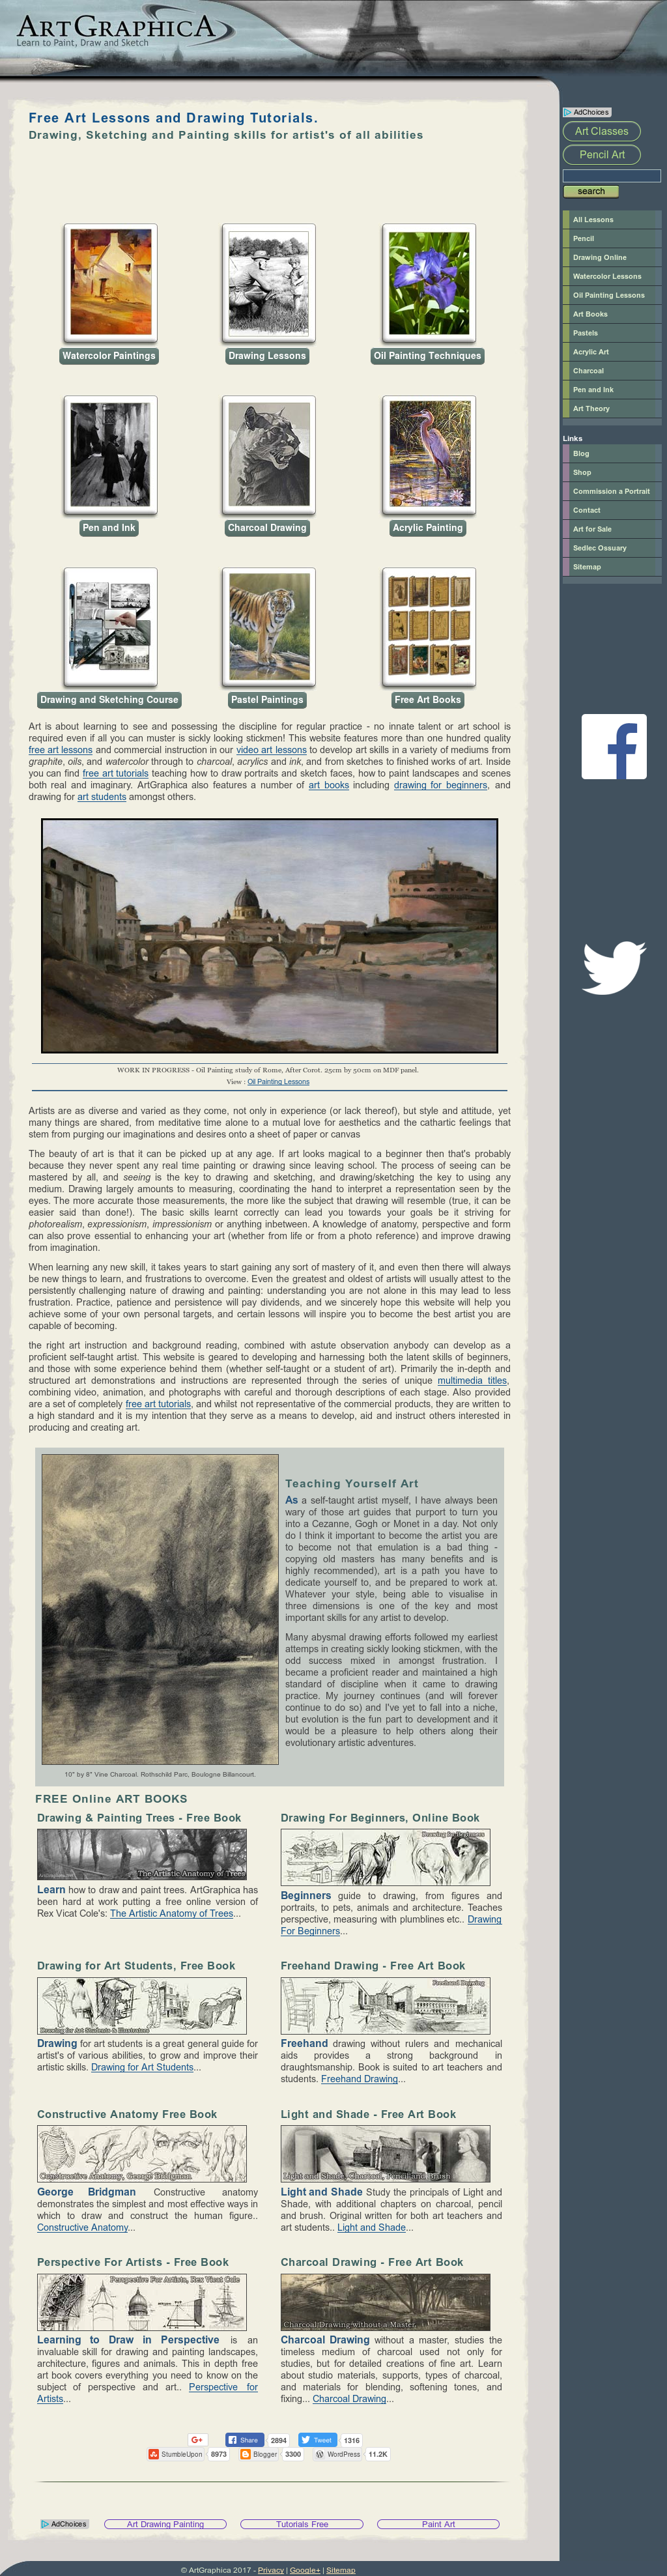 Artgraphica Competitors, Revenue and Employees - Owler Company Profile